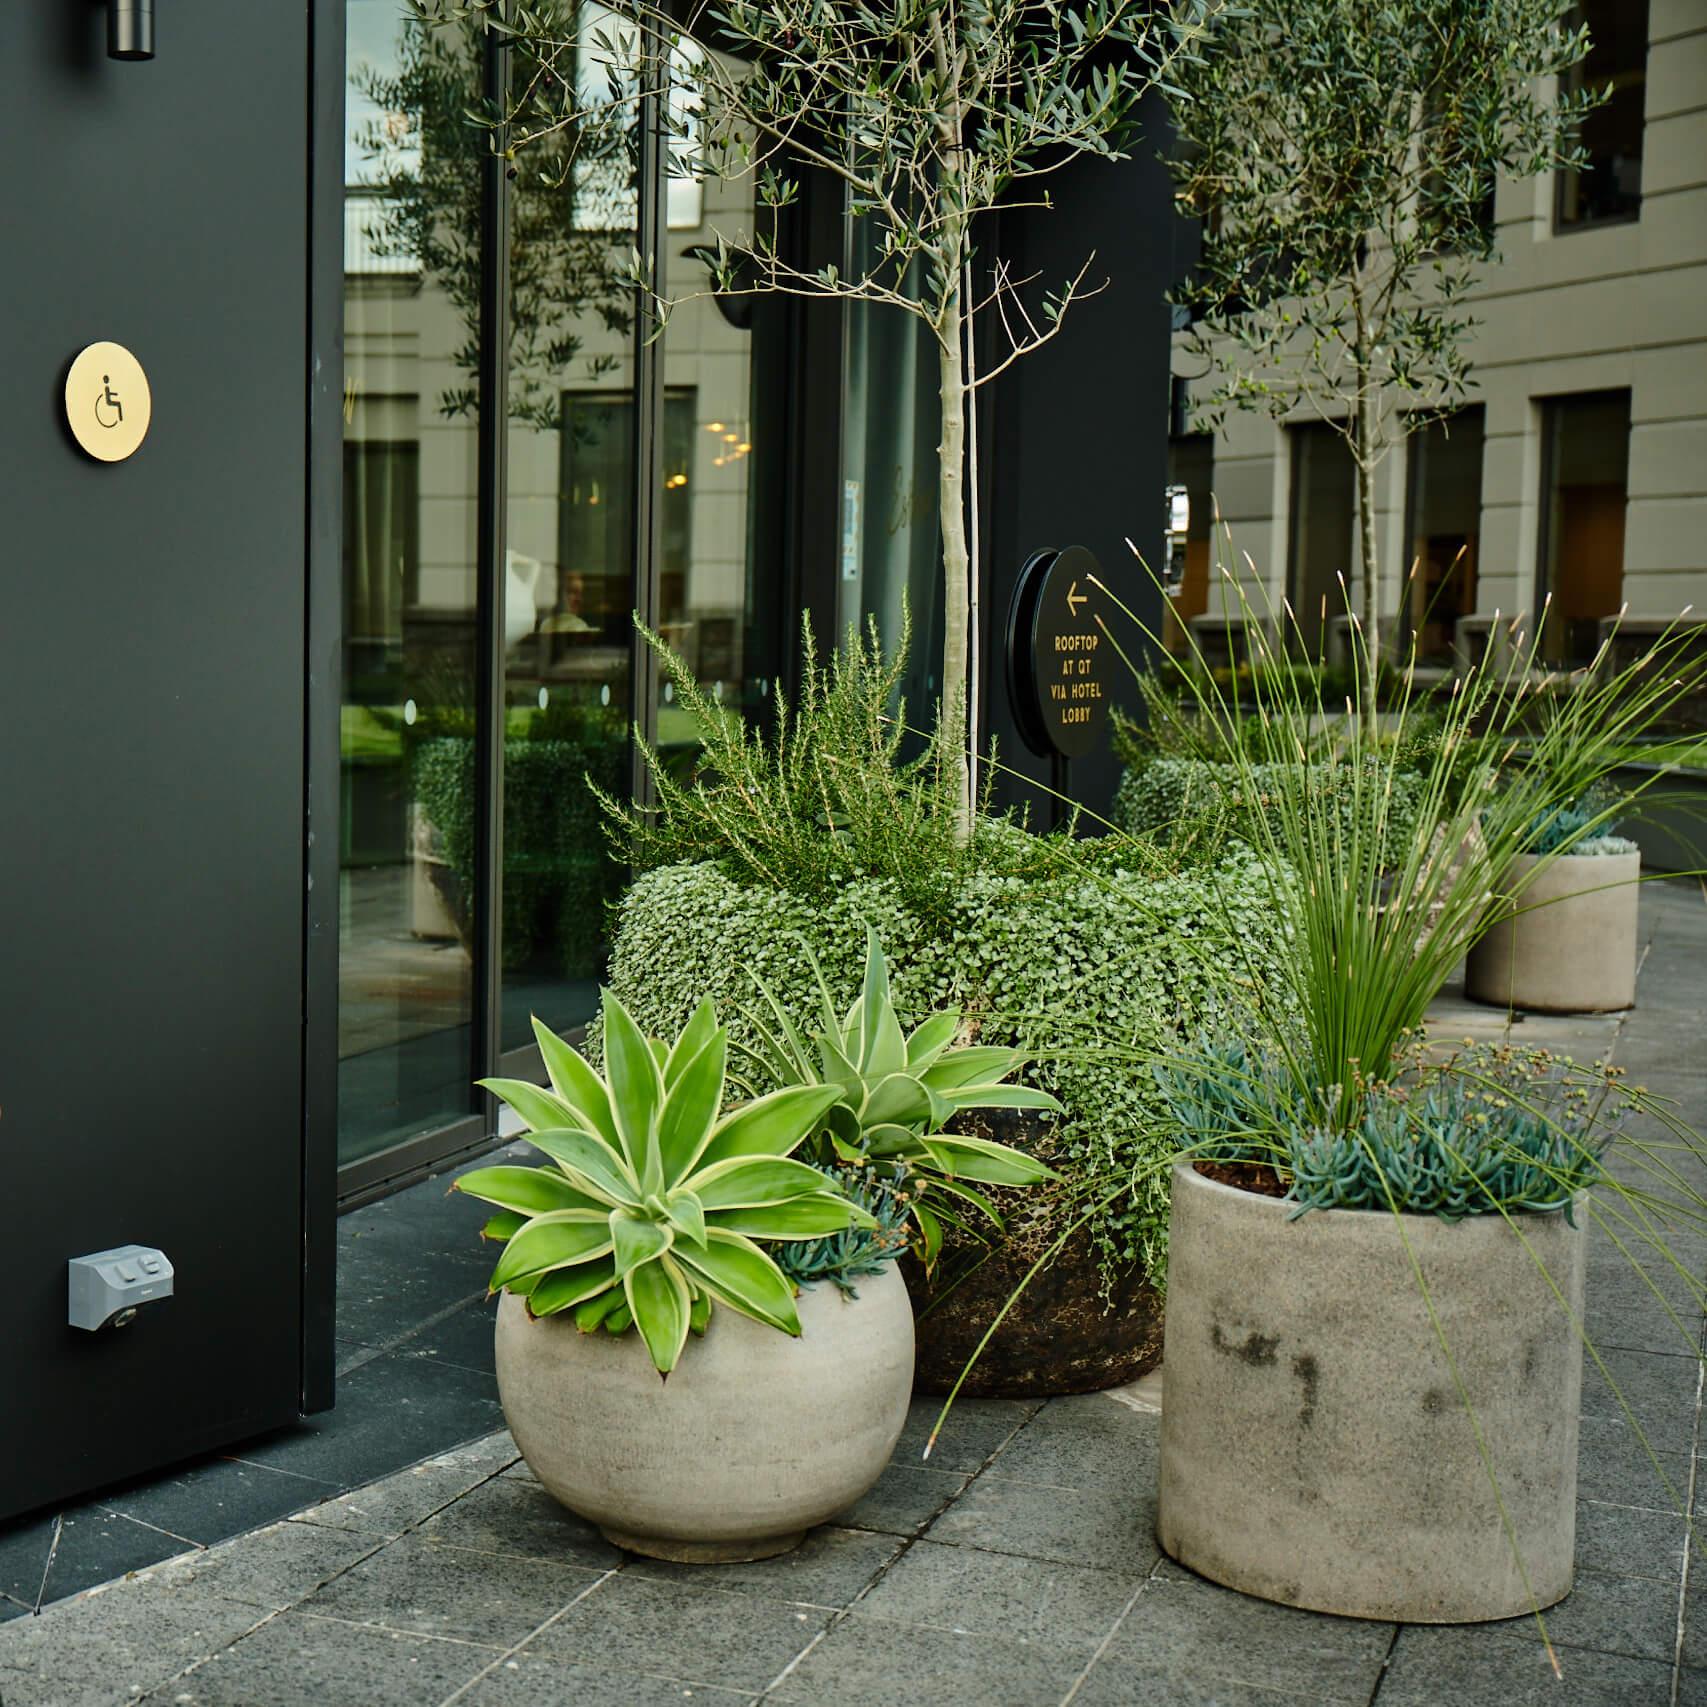 portfolio-hotels-and-apartments-qthotel-image2